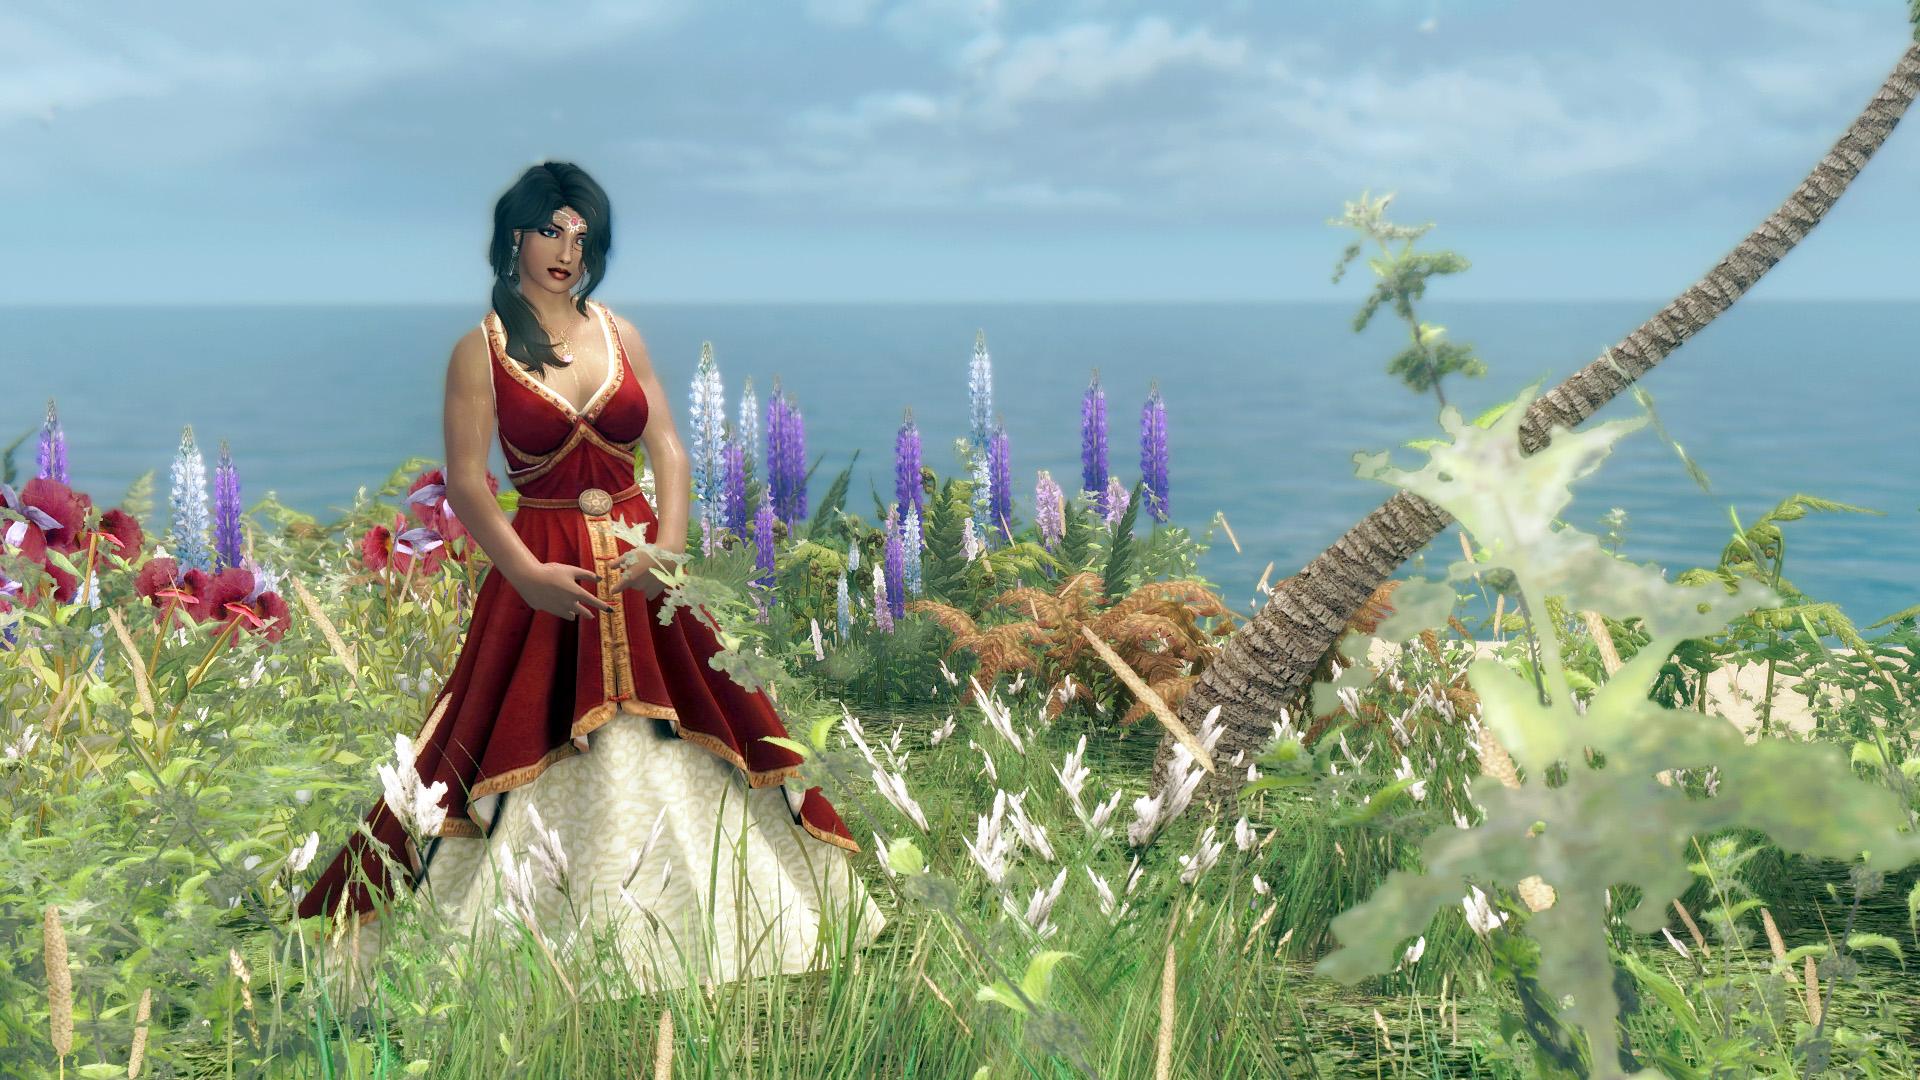 625. Платье красное, Island.jpg - Elder Scrolls 5: Skyrim, the CBBE, Сборка-21